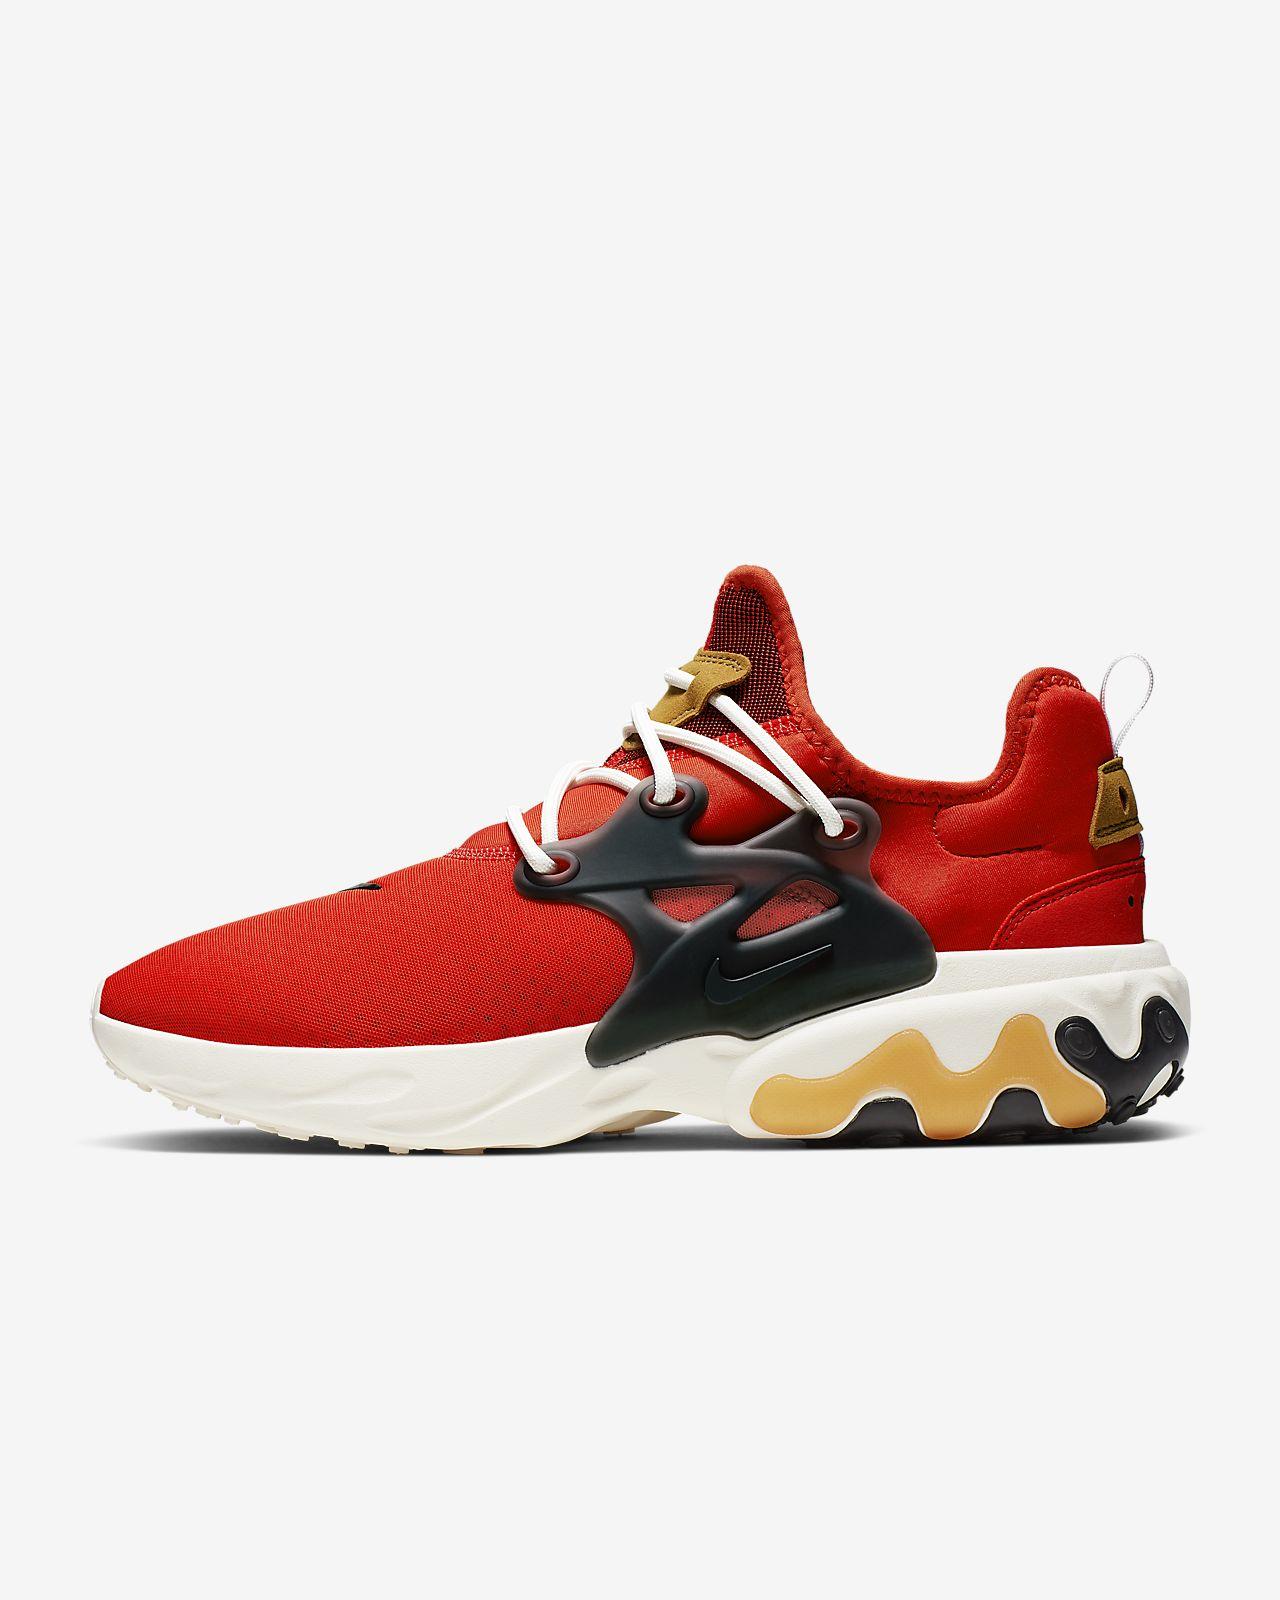 exquisite design popular brand exquisite style Pánská bota Nike React Presto